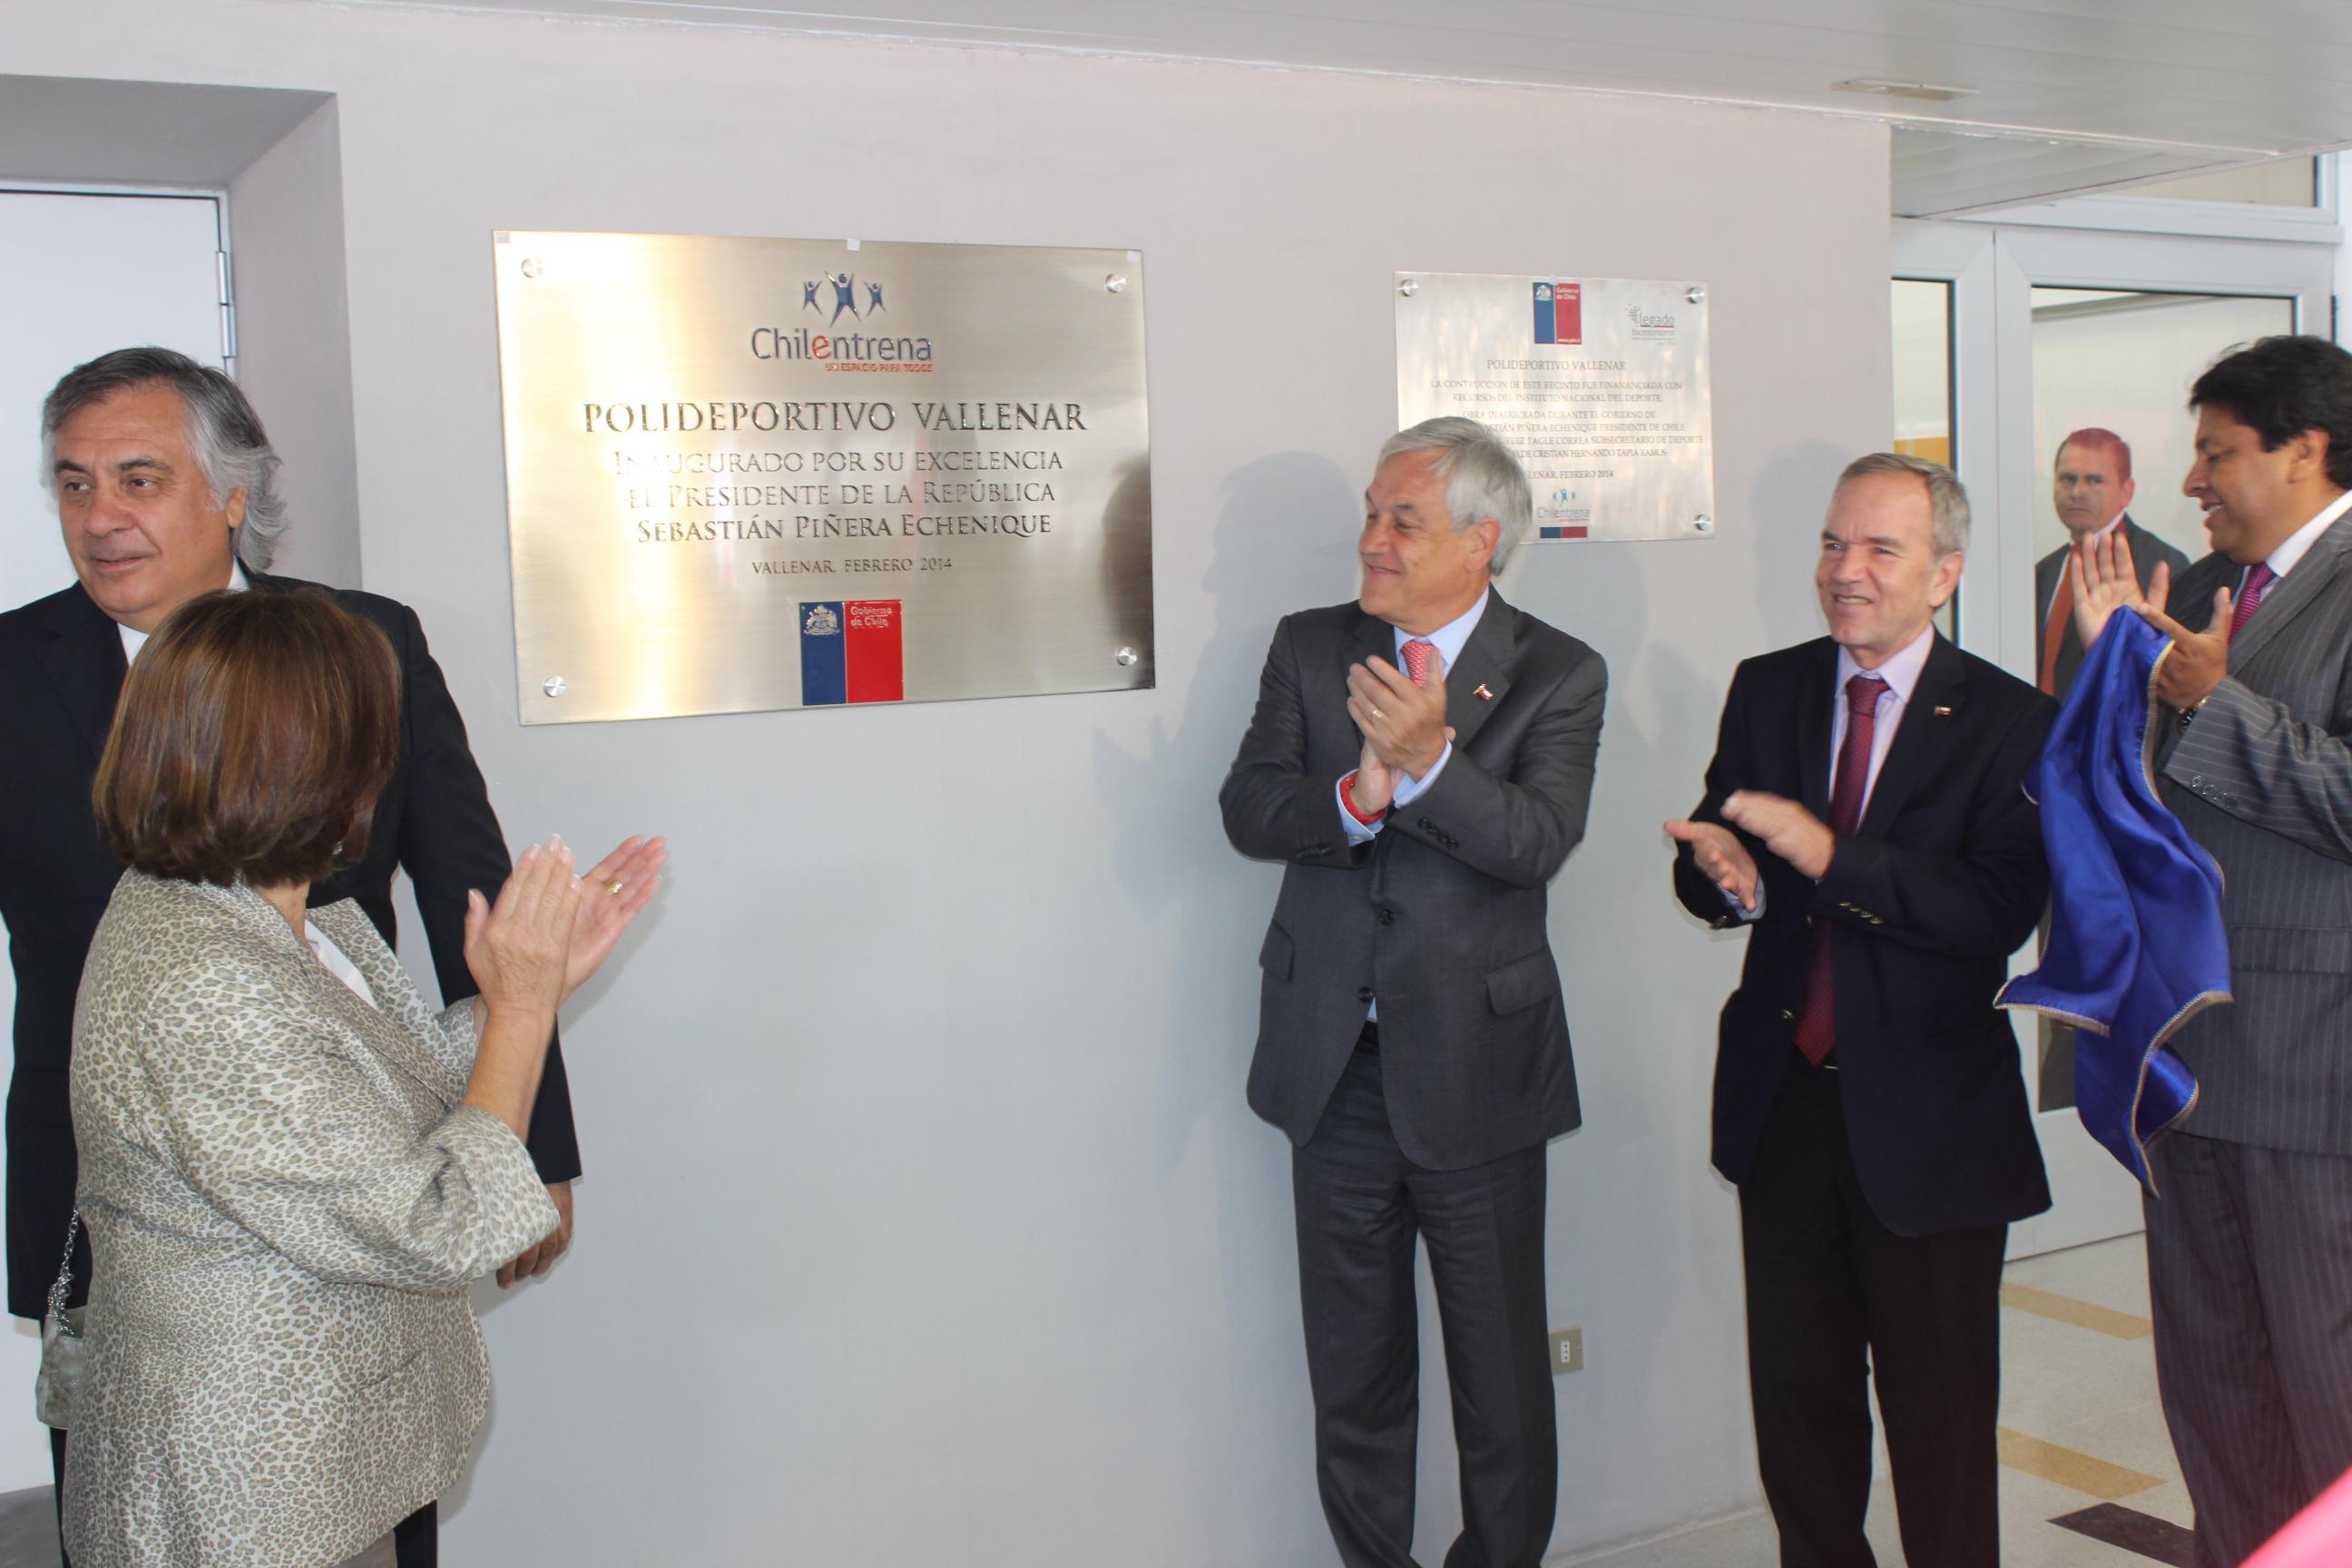 Inauguran Polideportivo en Vallenar